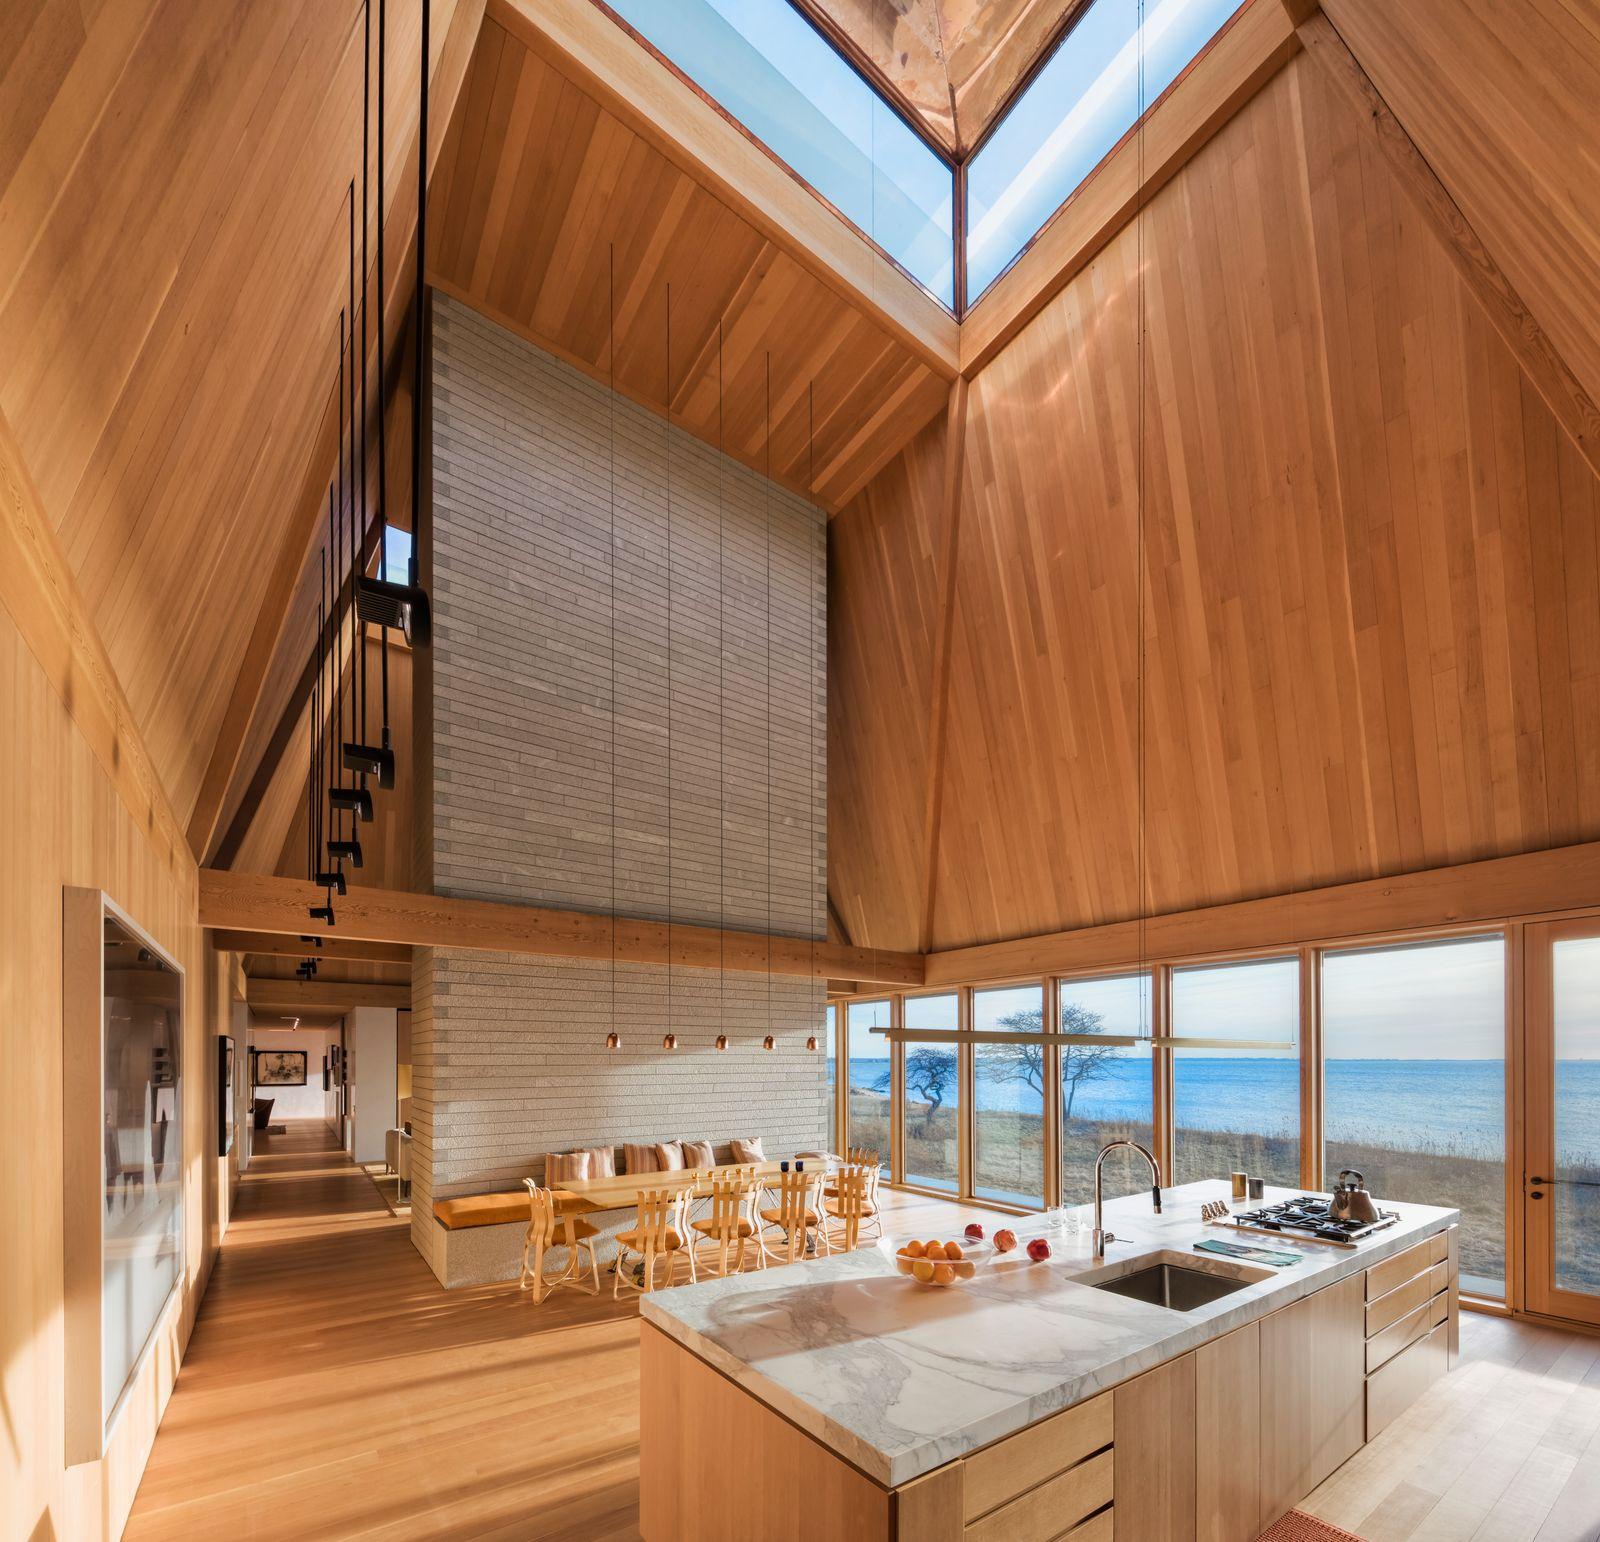 Bayhouse, Location: Bellport, New York, Architect: Rick Joy